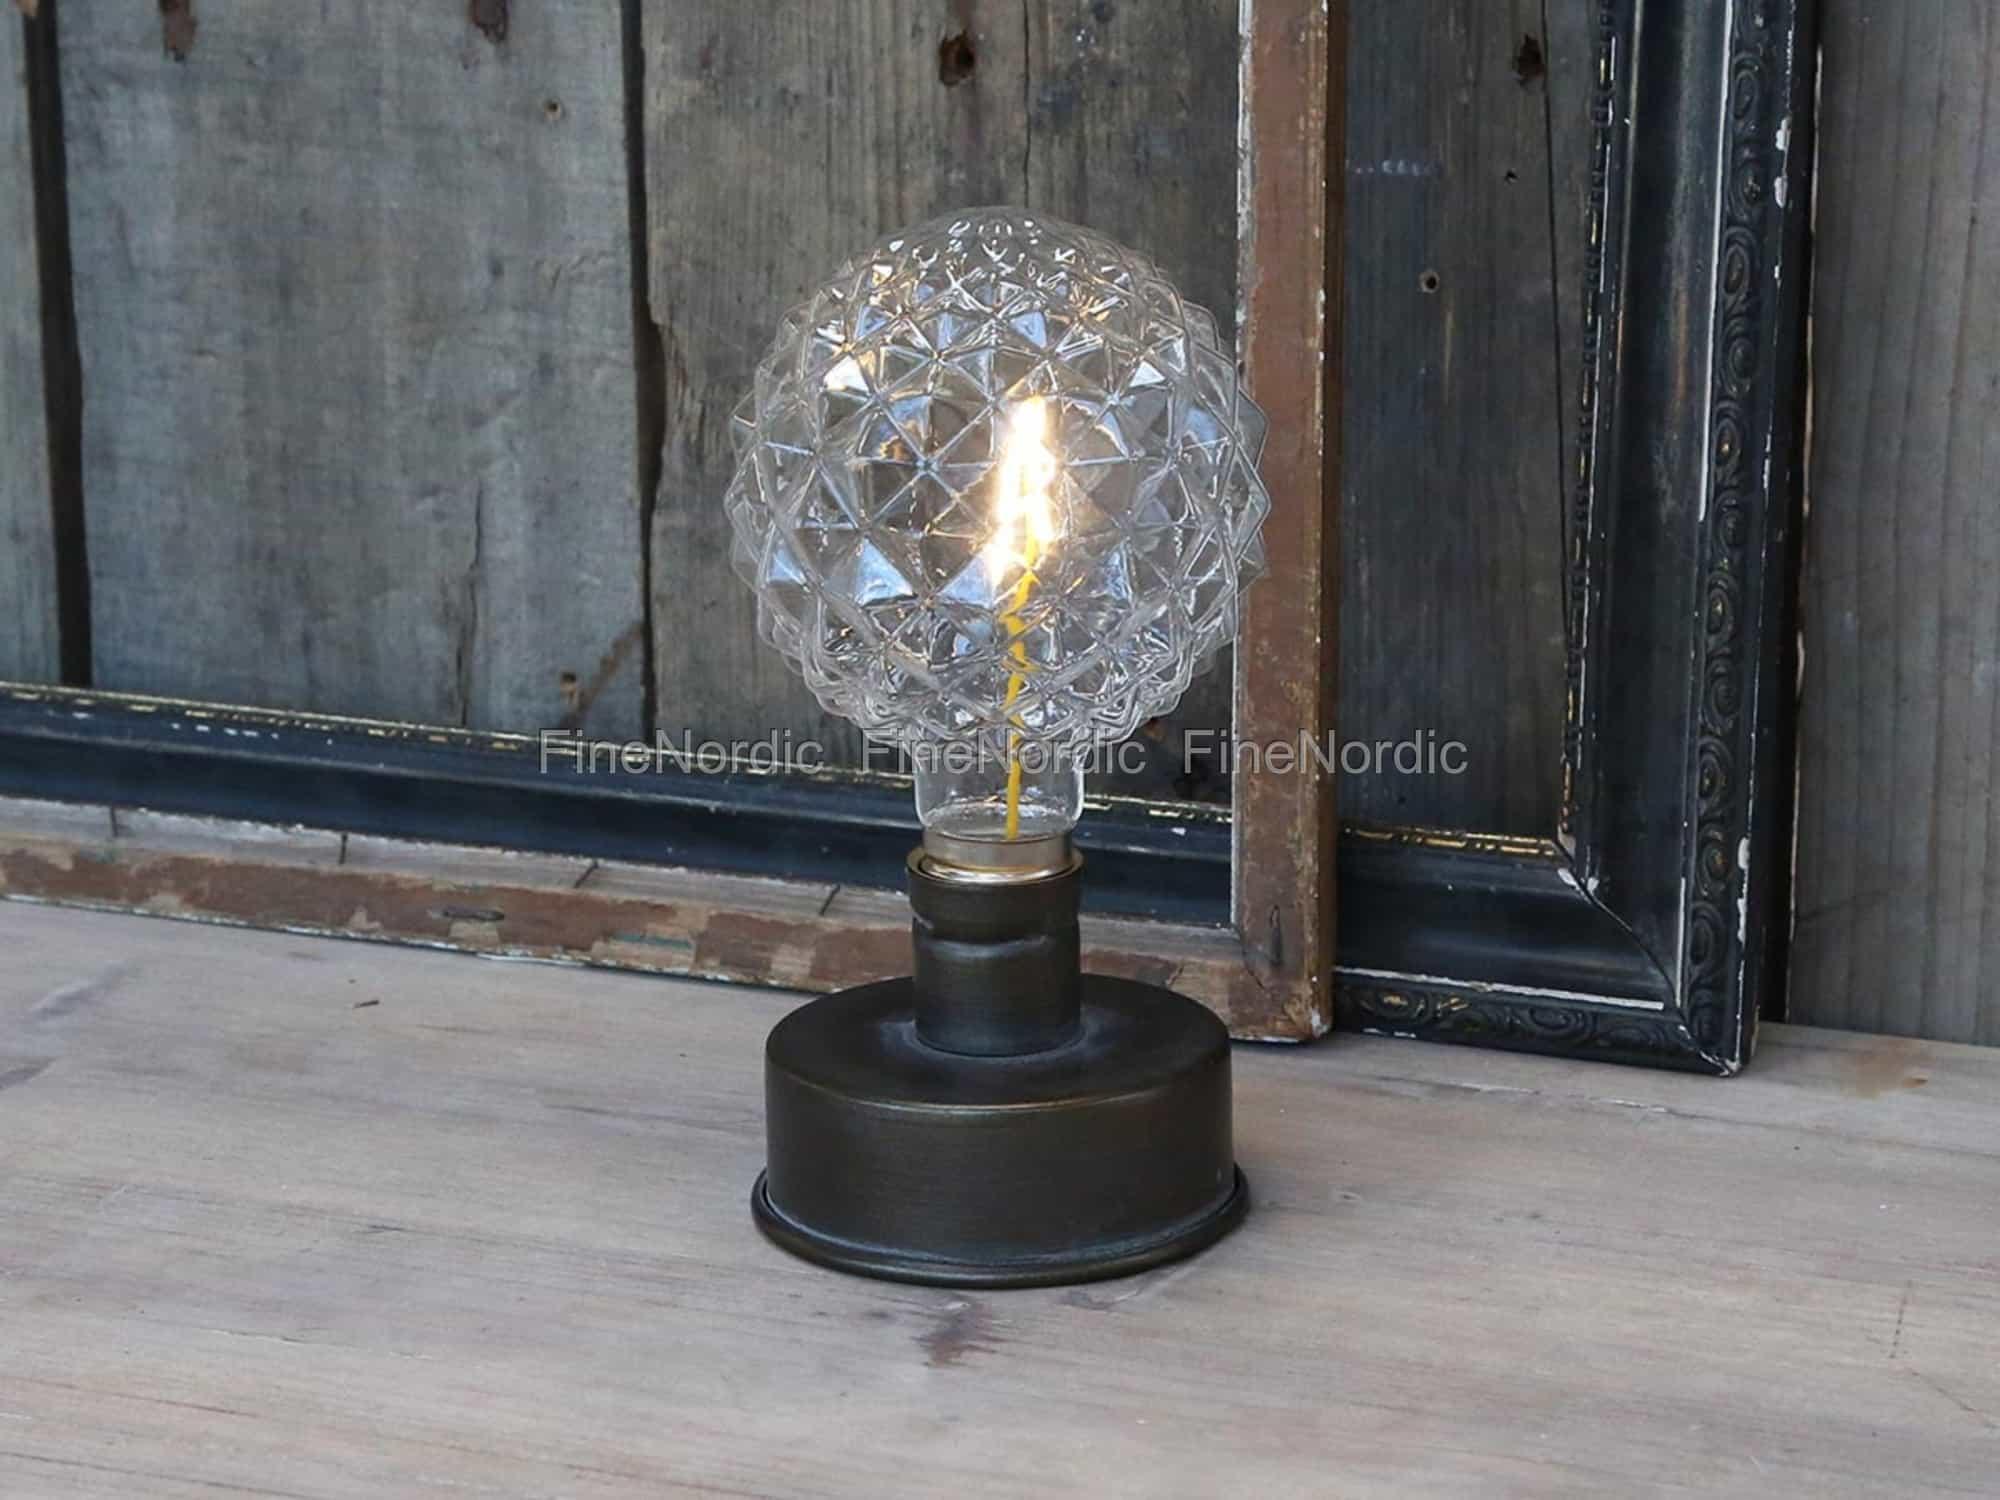 chic antique lampe mit gemusterte gl hbirne f r batterie. Black Bedroom Furniture Sets. Home Design Ideas